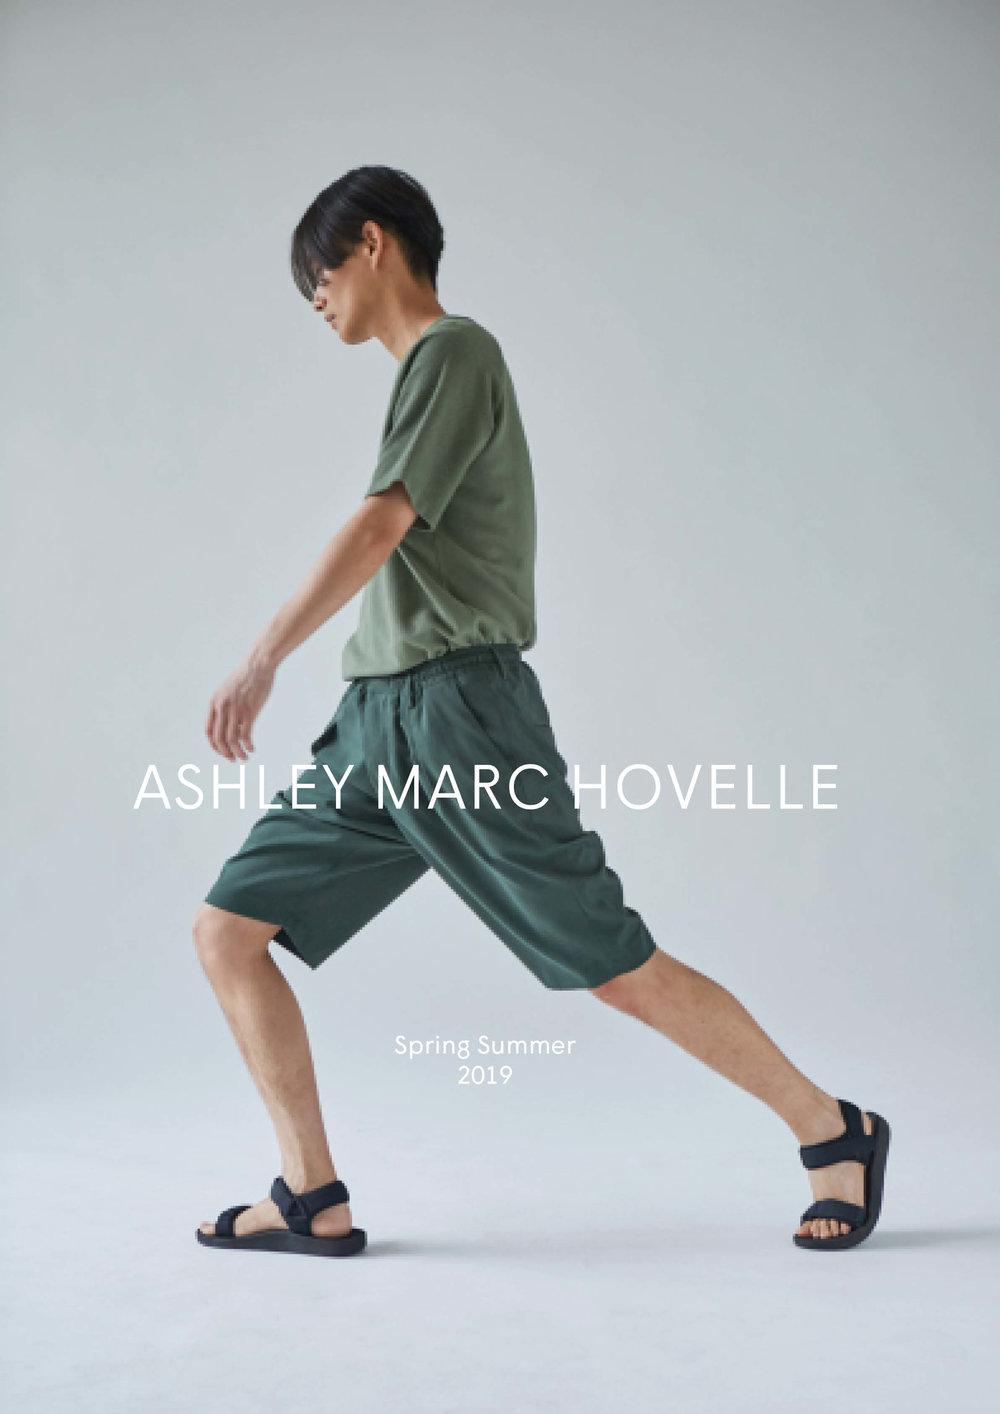 Ashley Marc Hovelle SS19 Lookbook final sml.jpg